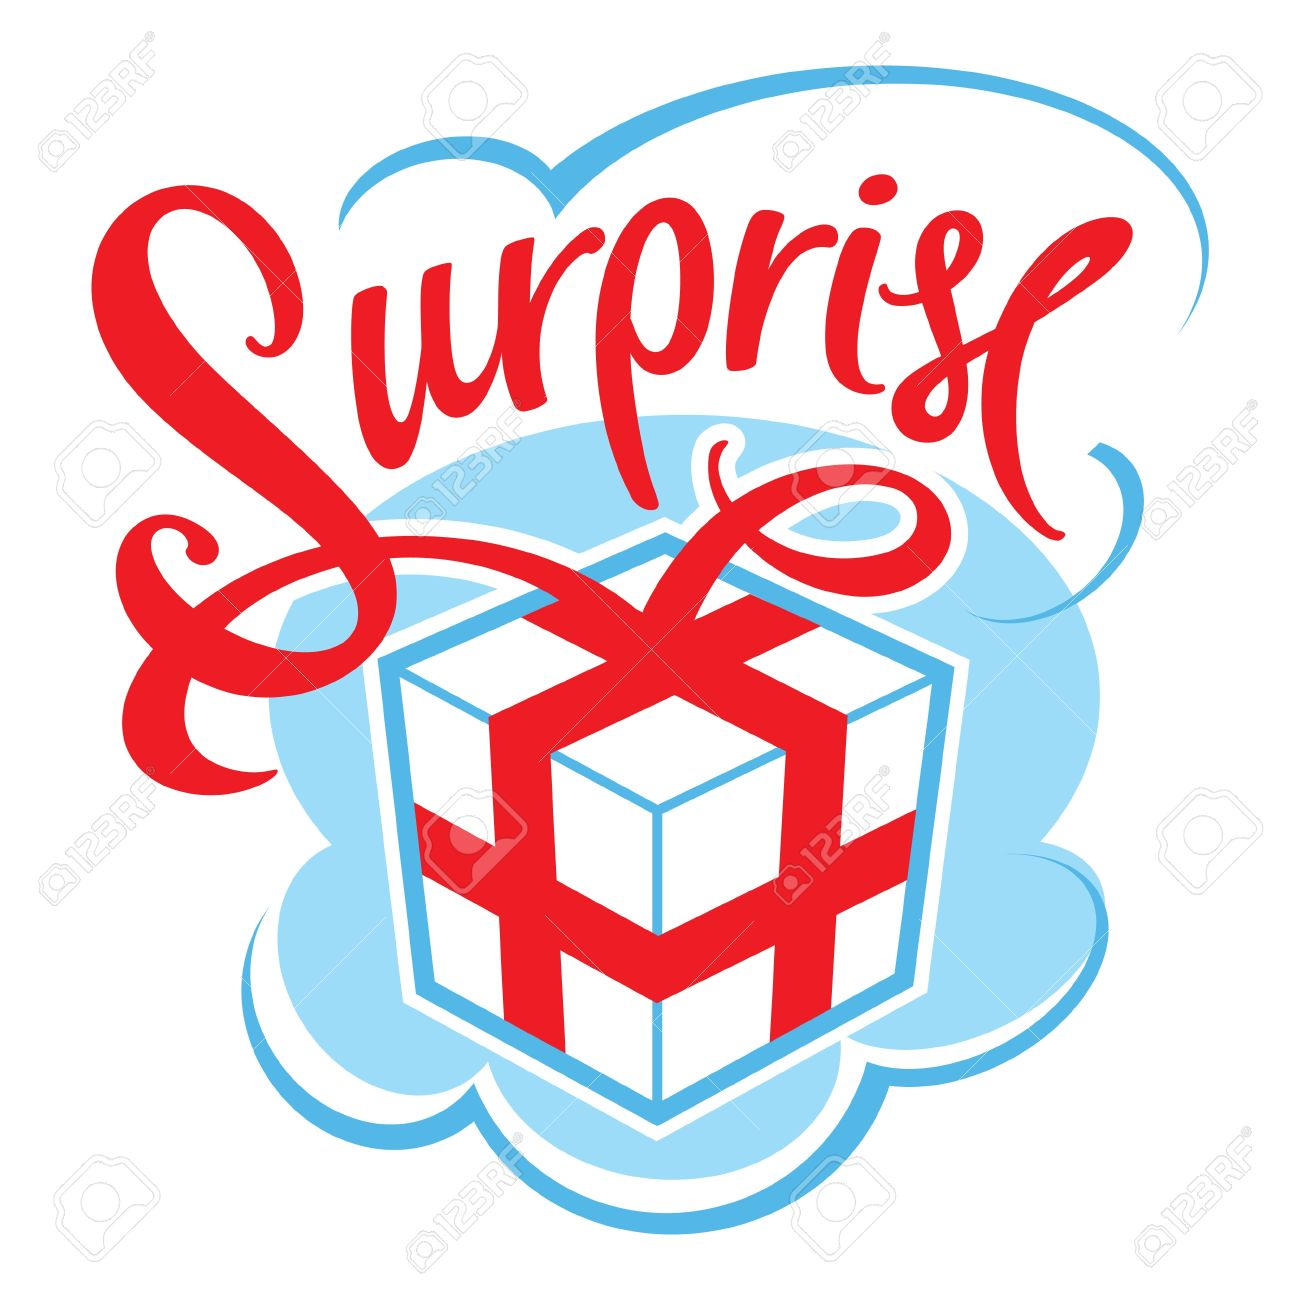 Gift box surprise for birthday, celebration, event, christmas, wedding Stock Vector - 14964467